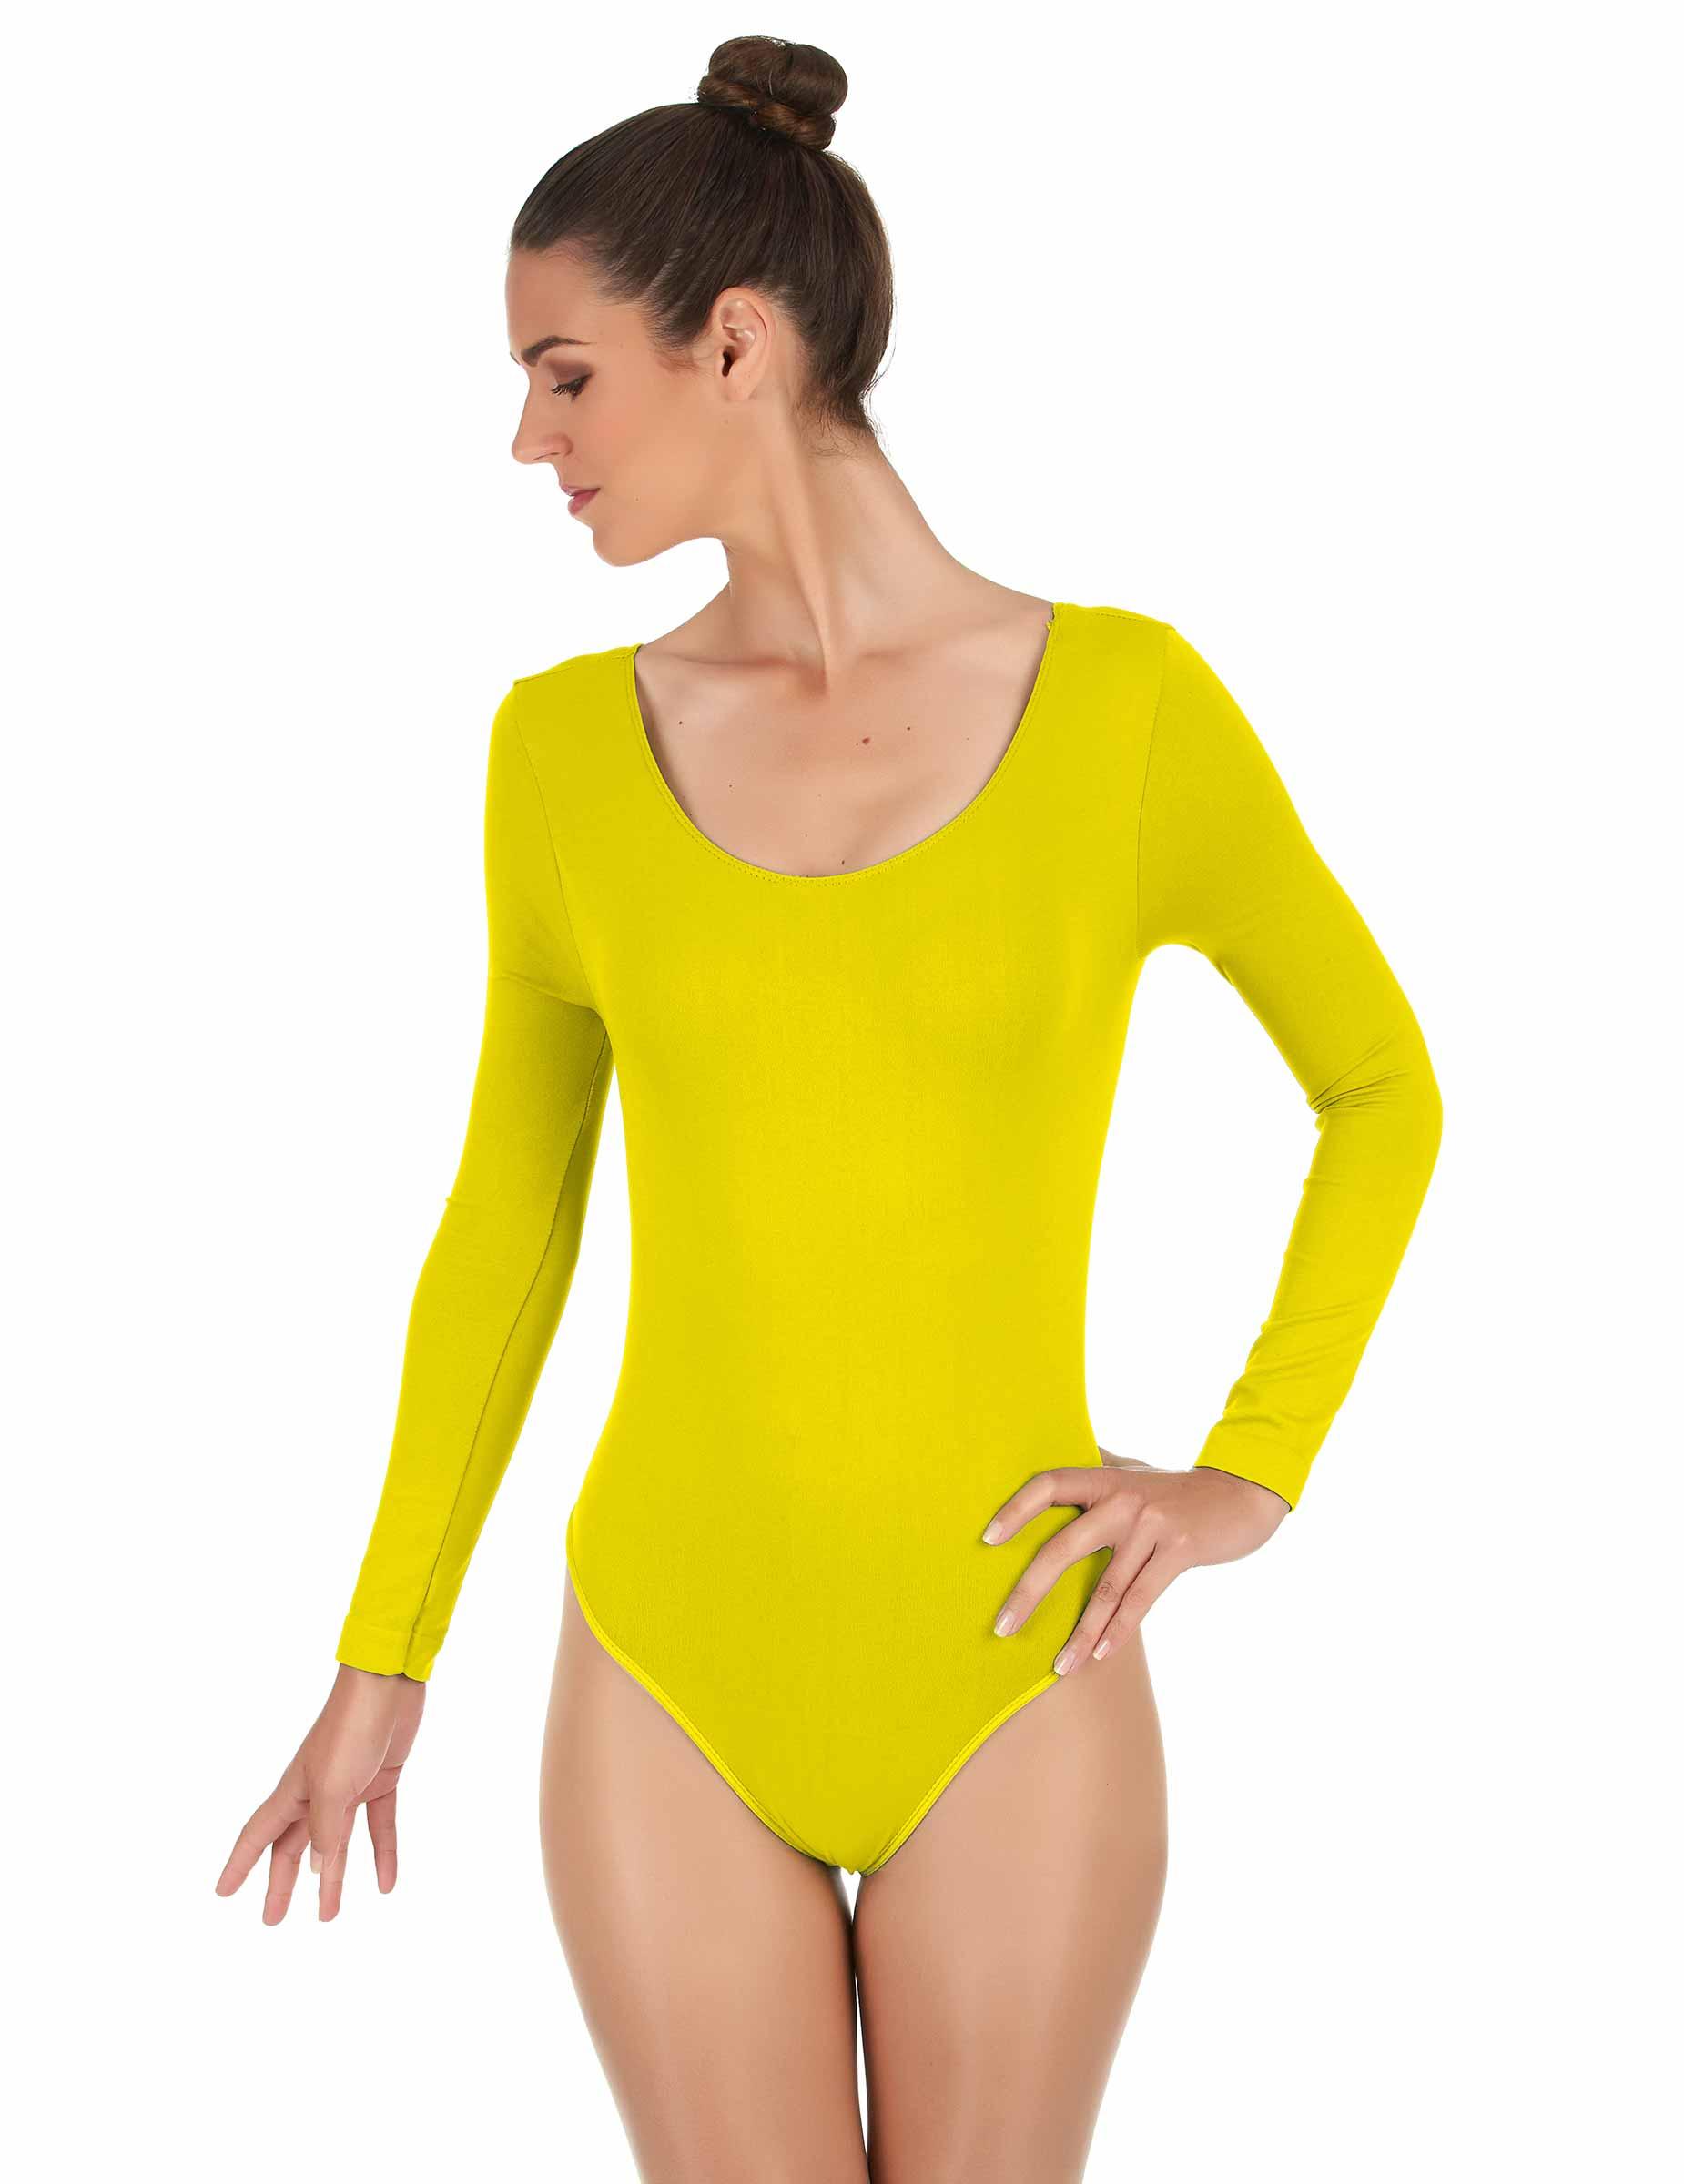 Body jaune adulte   Deguise-toi 87933b37b73